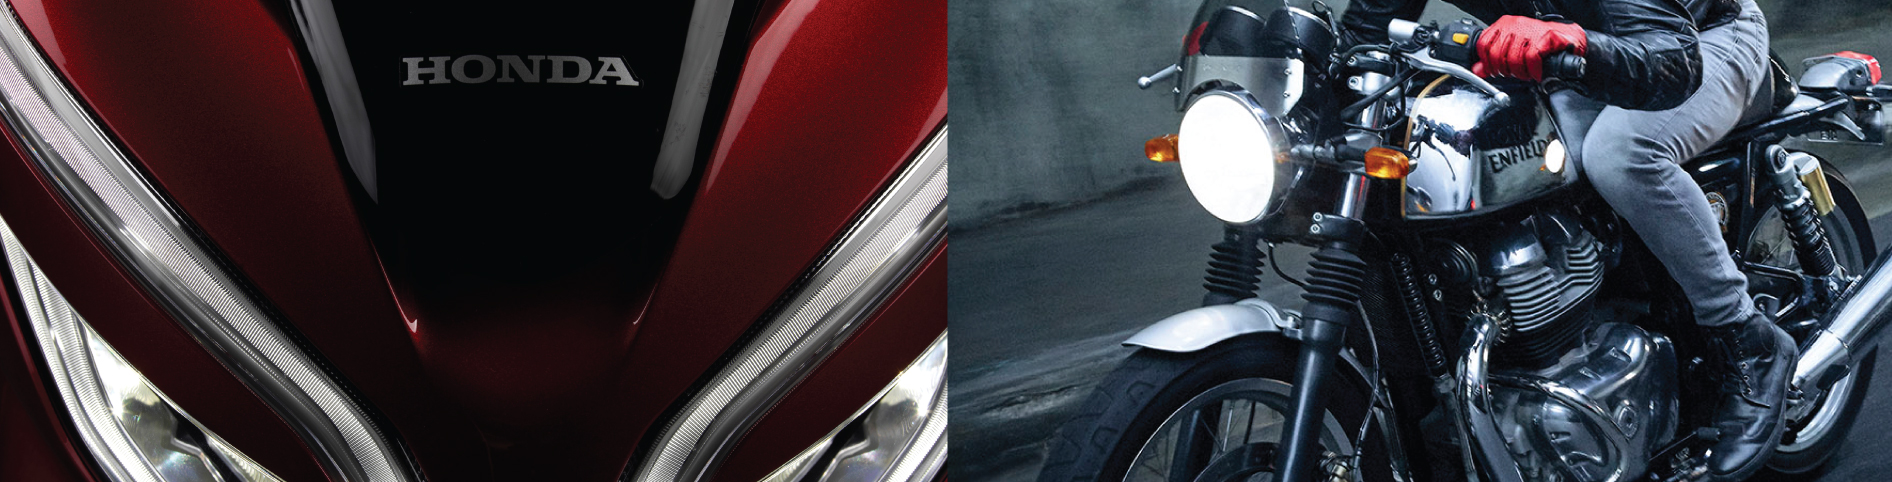 Ecosse Motorcycles Scotlands Premier Honda Yamaha Motorcycle Dealer